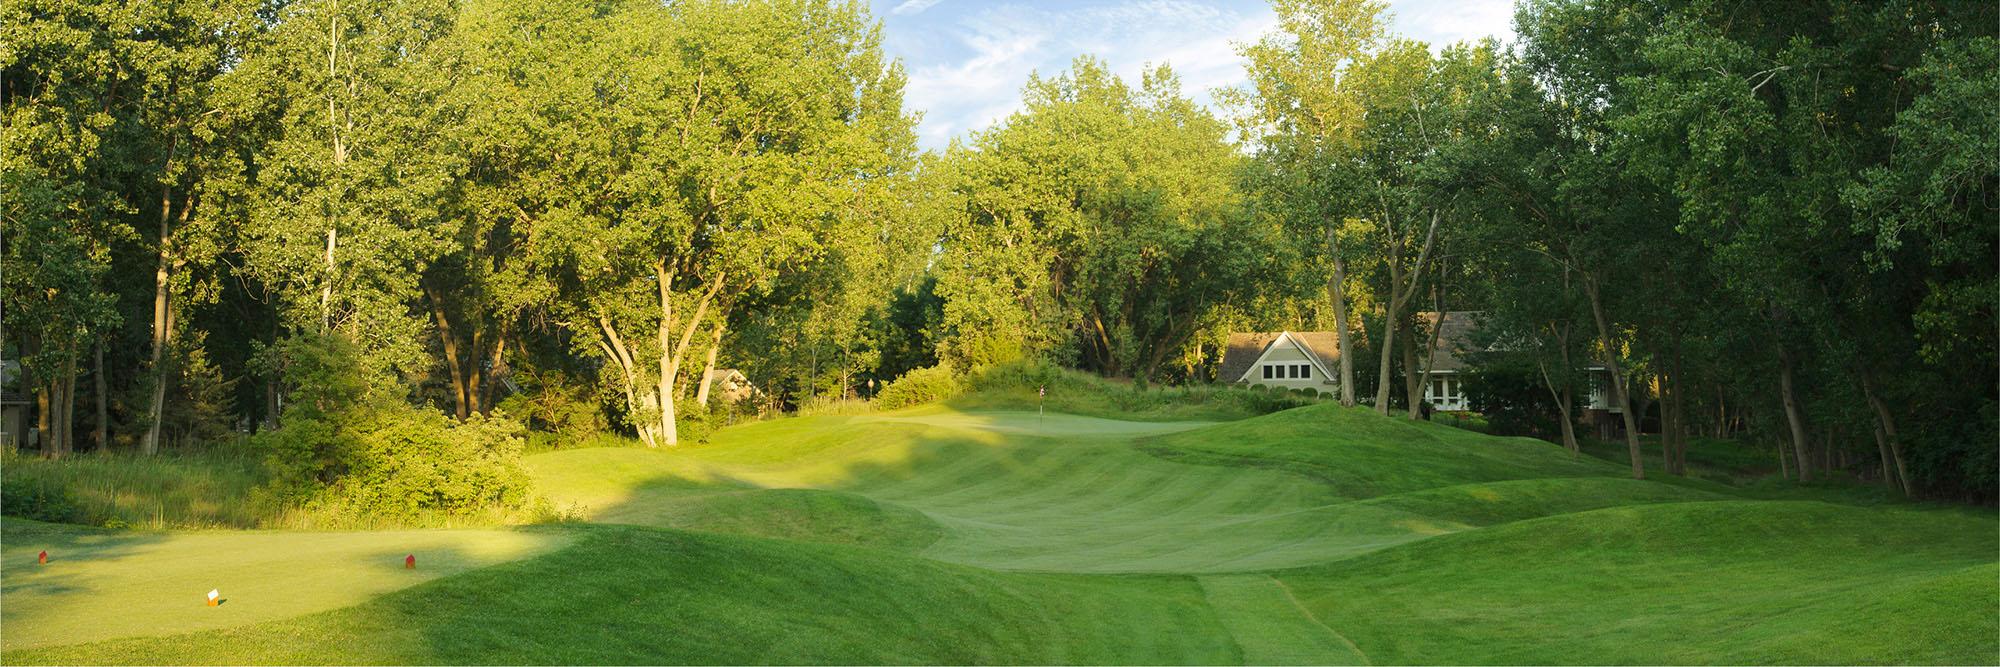 Golf Course Image - Dakota Dunes No. 16